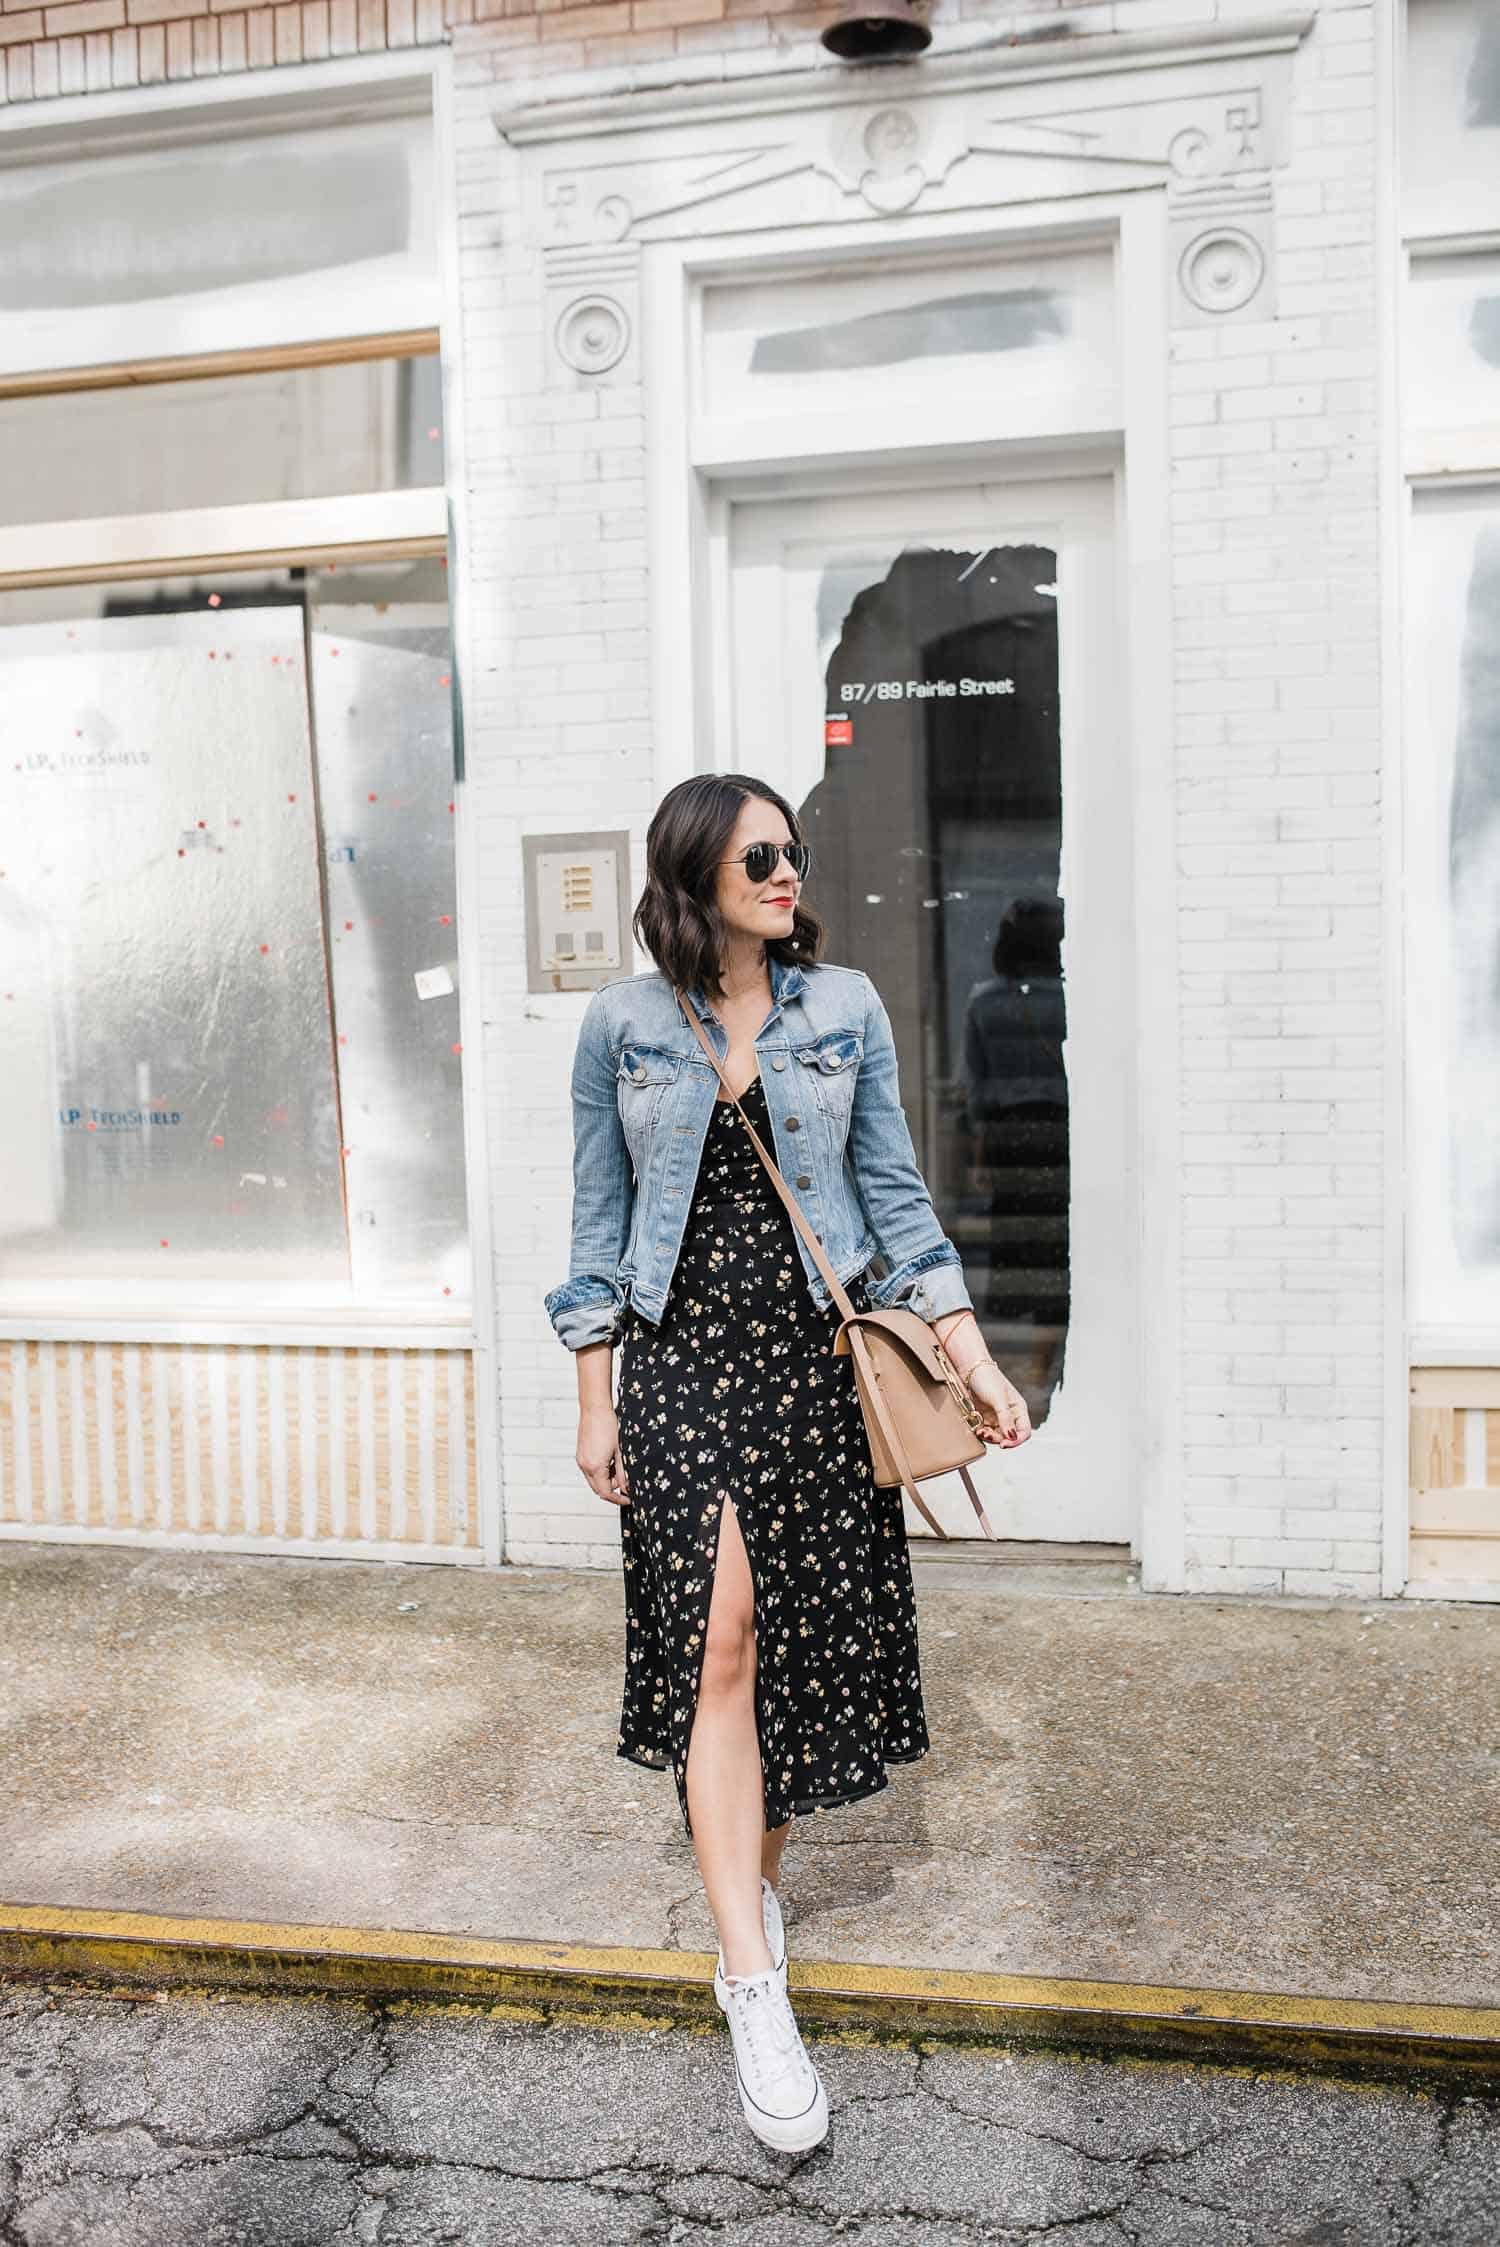 Jessica Camerata shares her Reformation sale favorites